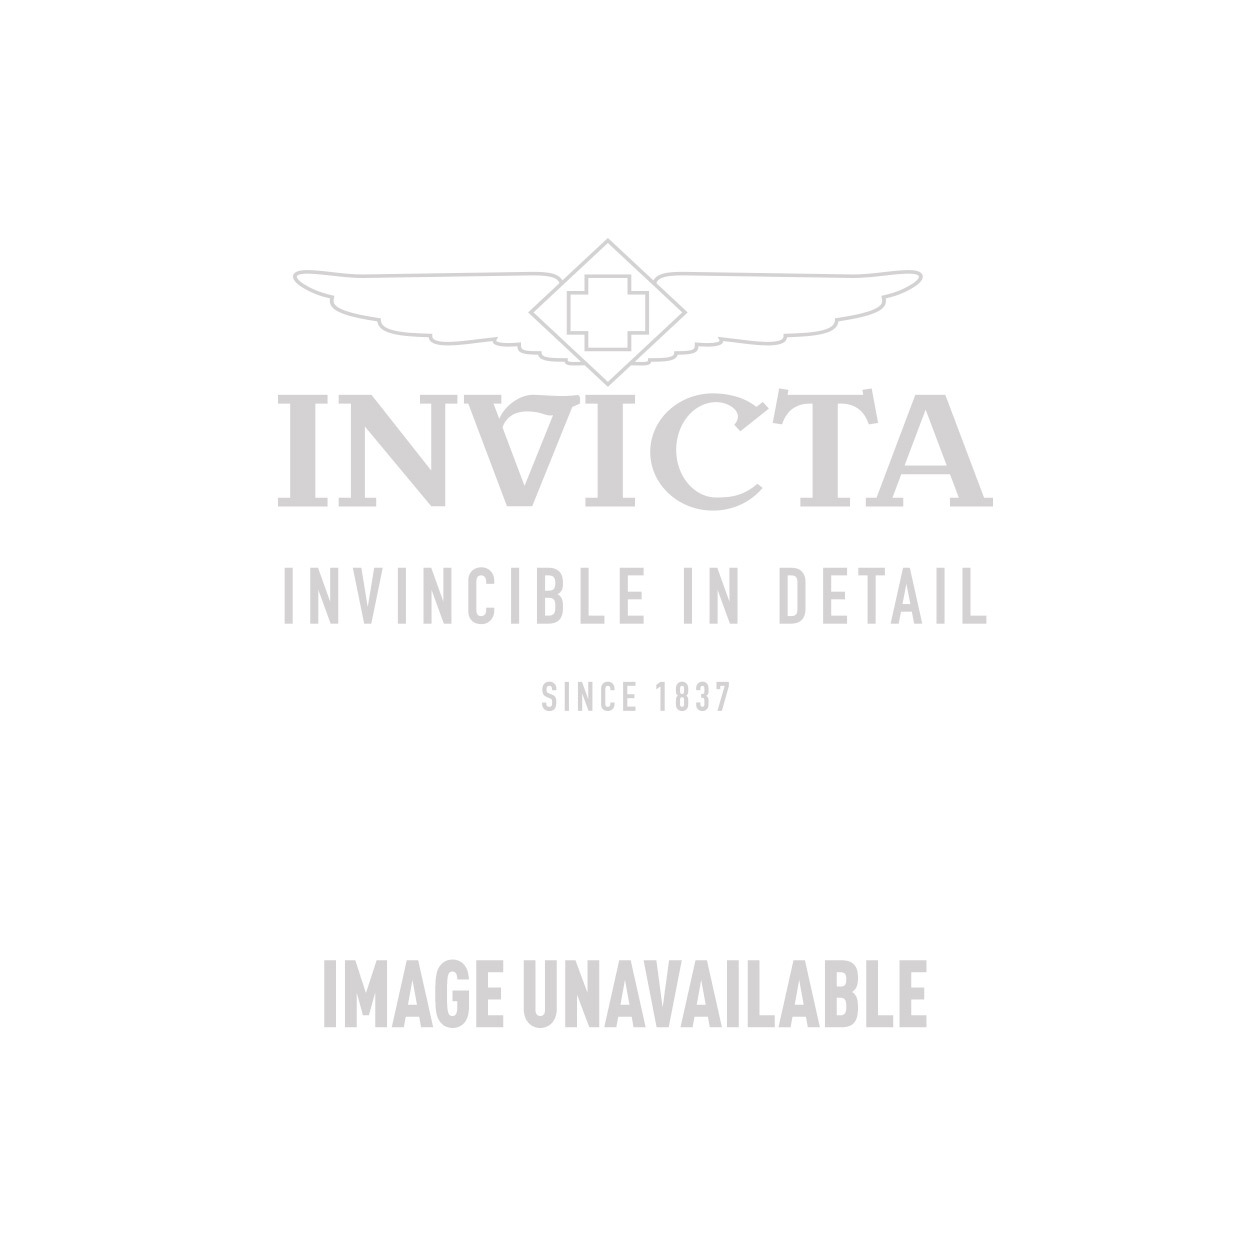 Invicta Excursion Swiss Made Quartz Watch - Purple, Titanium case with Grey tone Silicone band - Model 18559